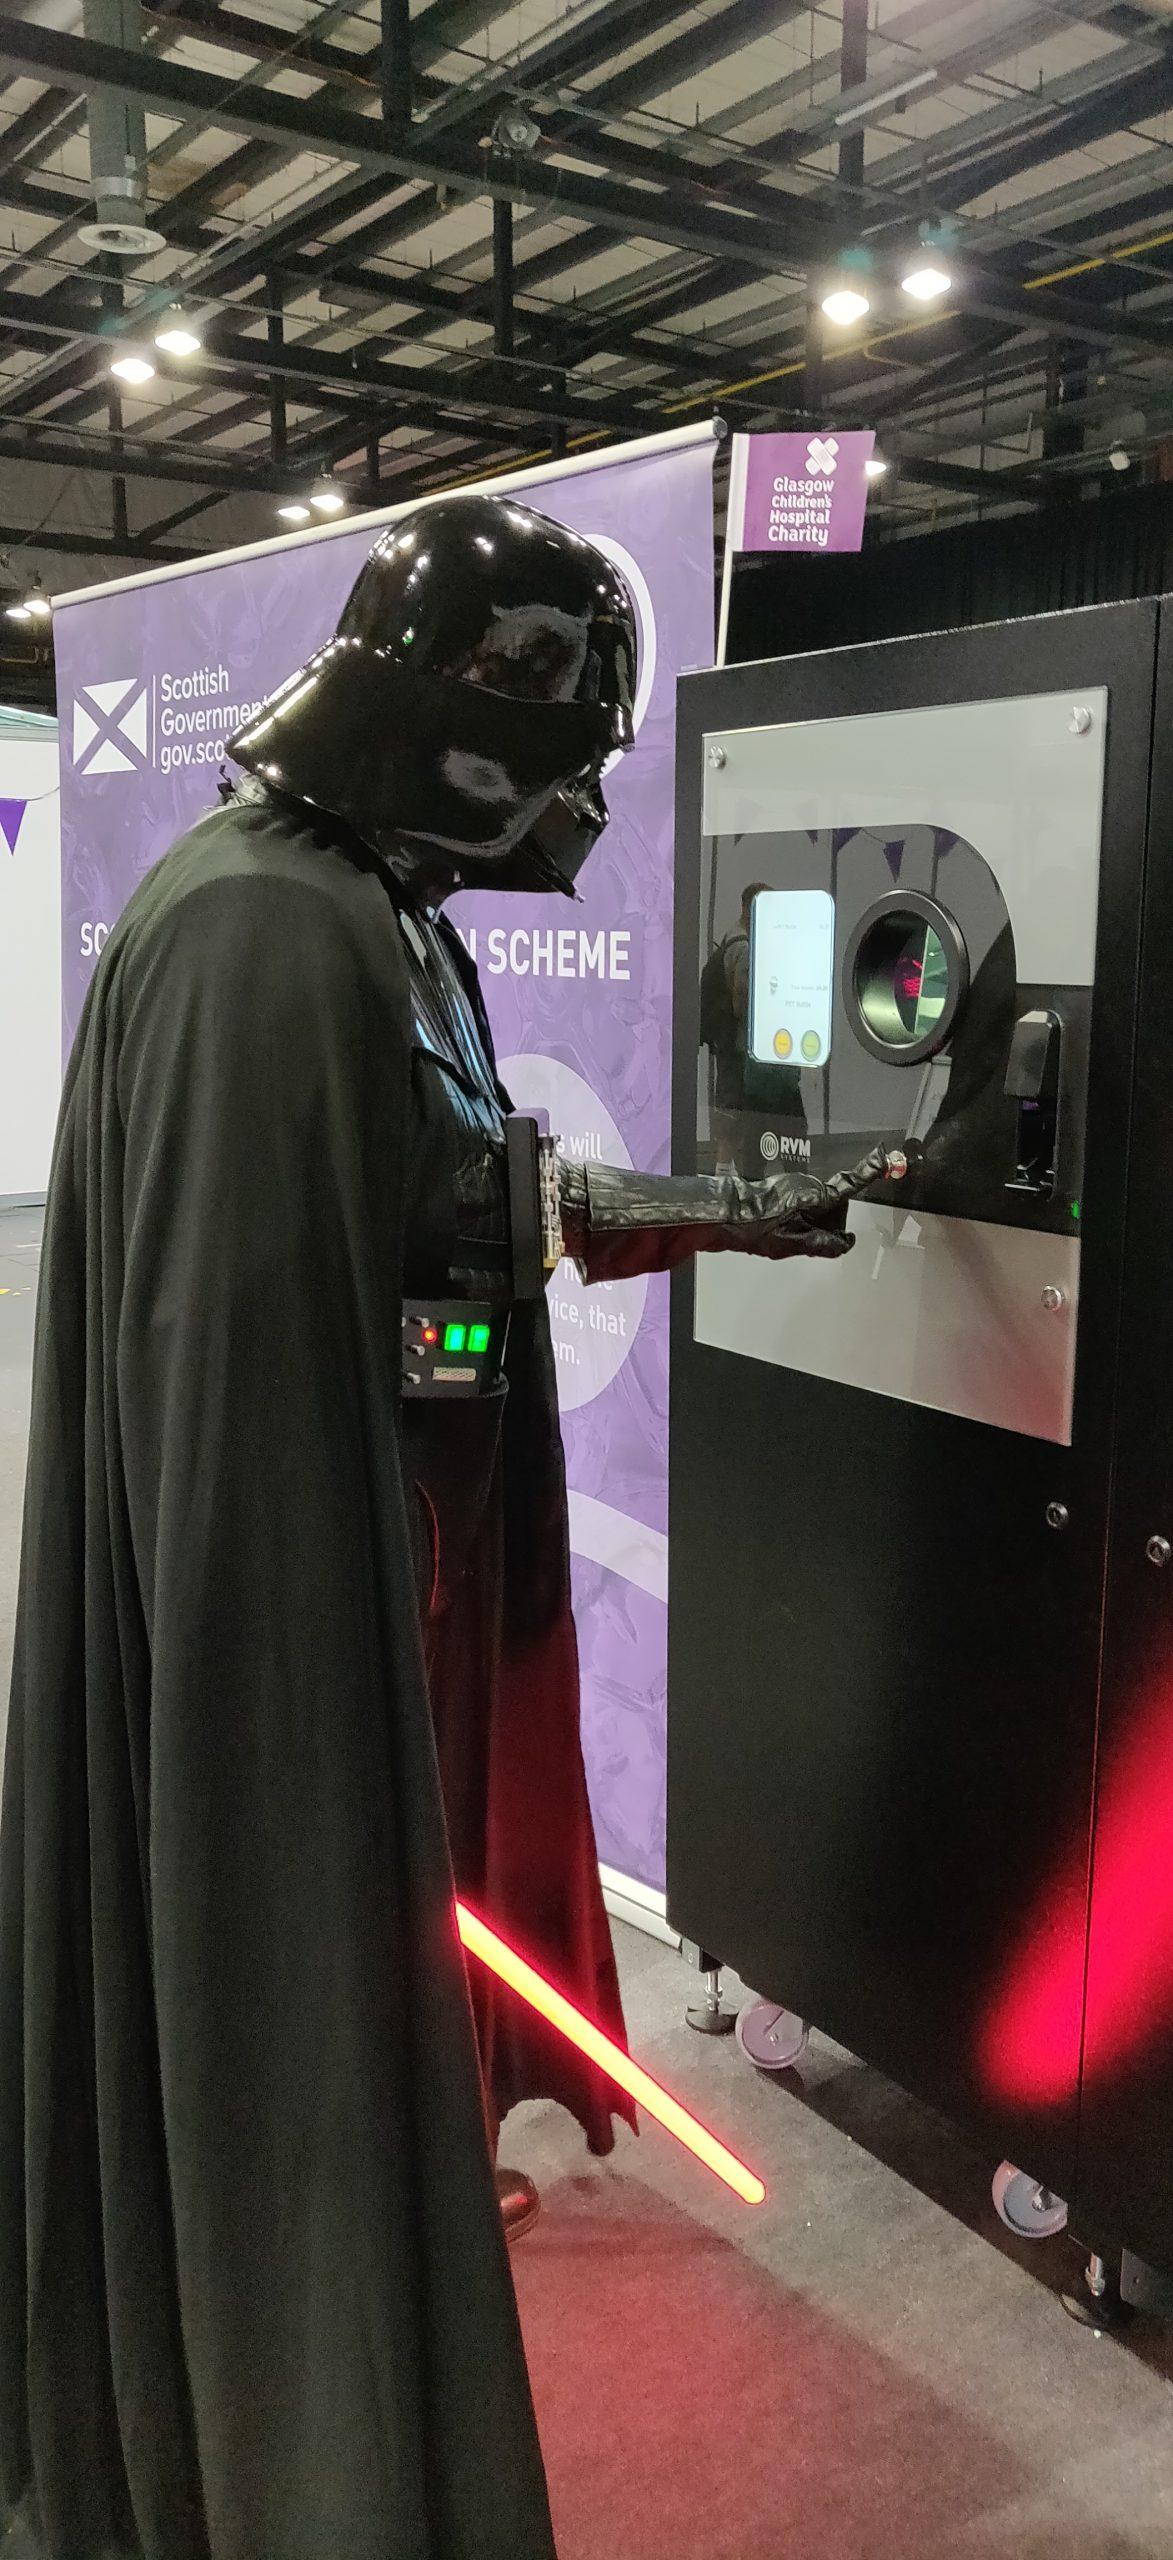 Darth Vader using Reverse Vending at Zero Waste Scotland Stand